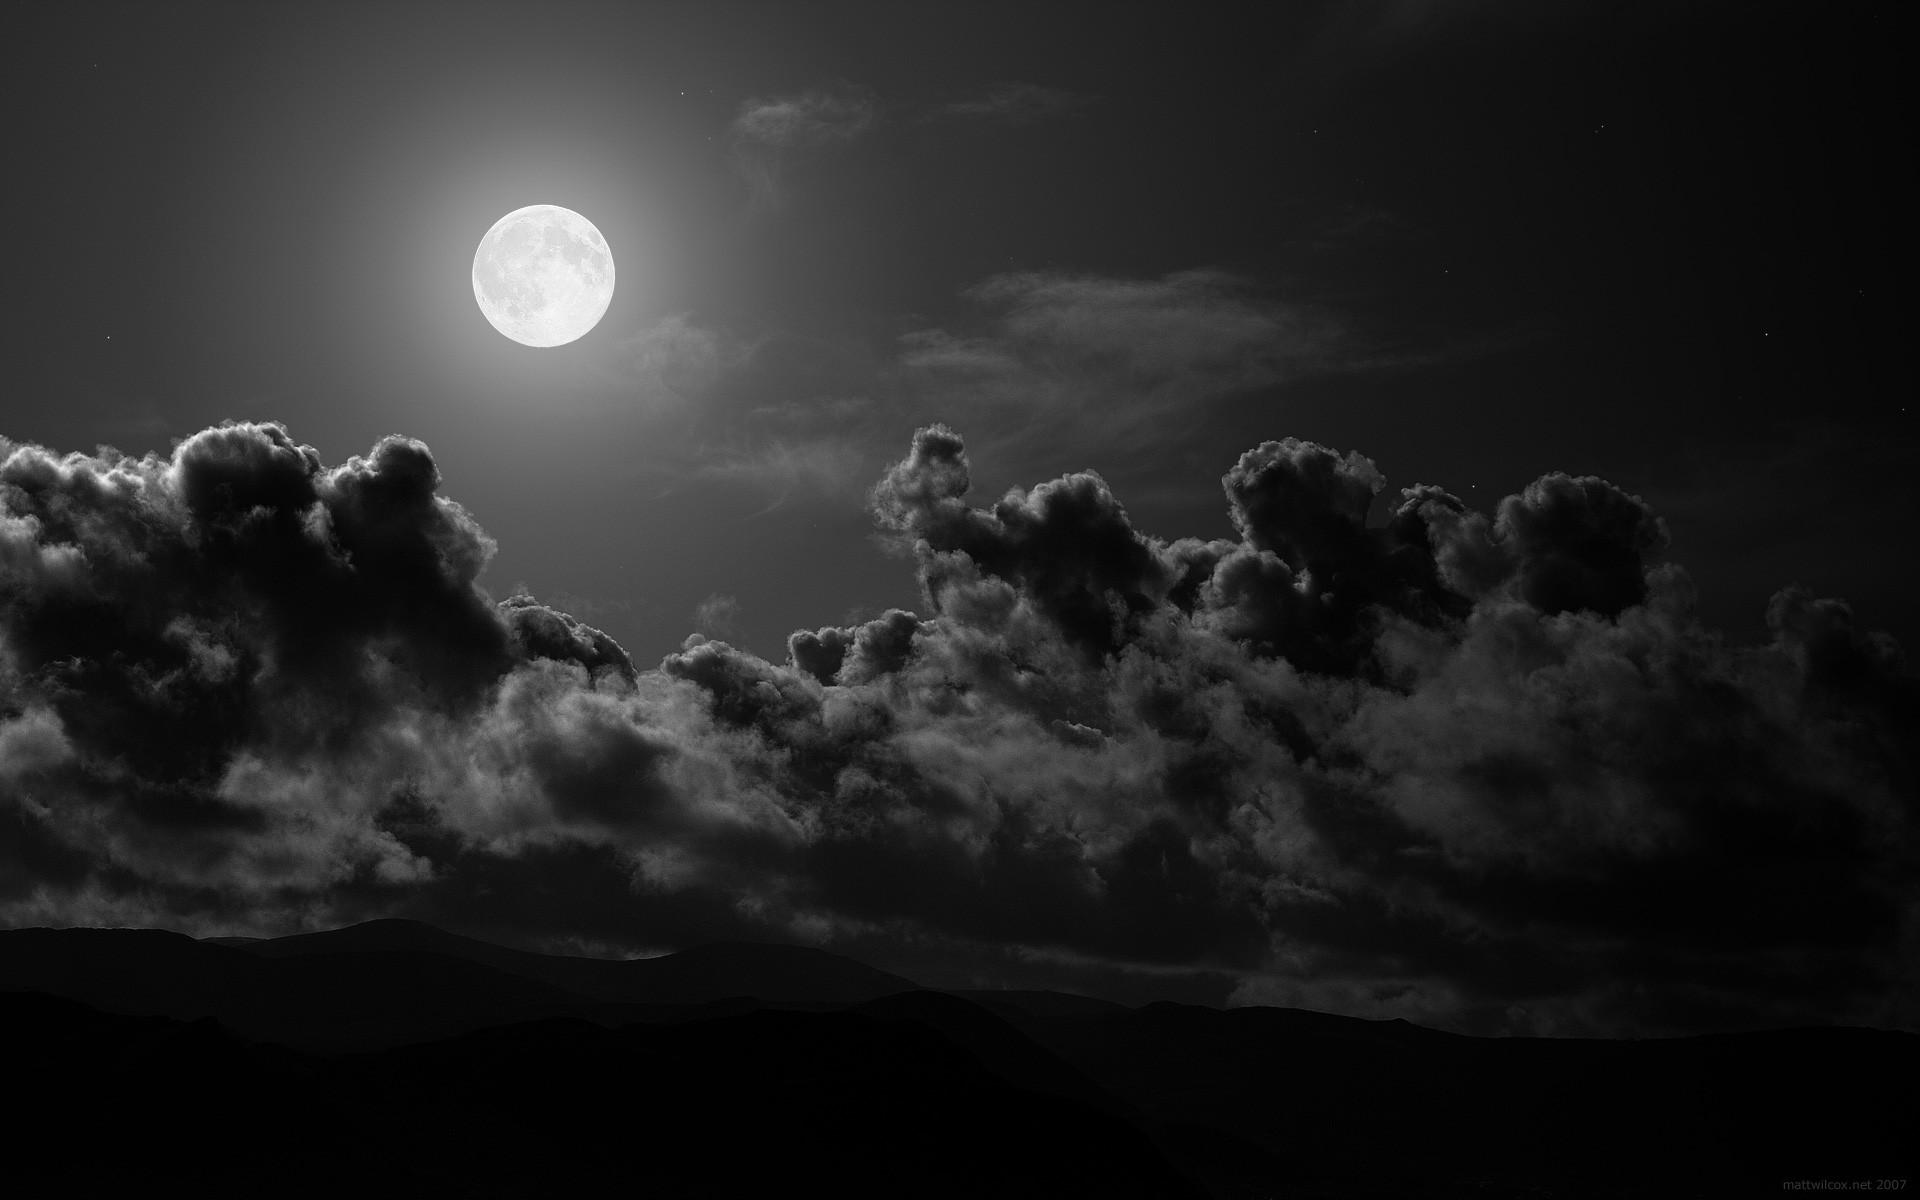 dope-awesome-sky-dark-landscape-moon-1920×1200-Wallpaper-